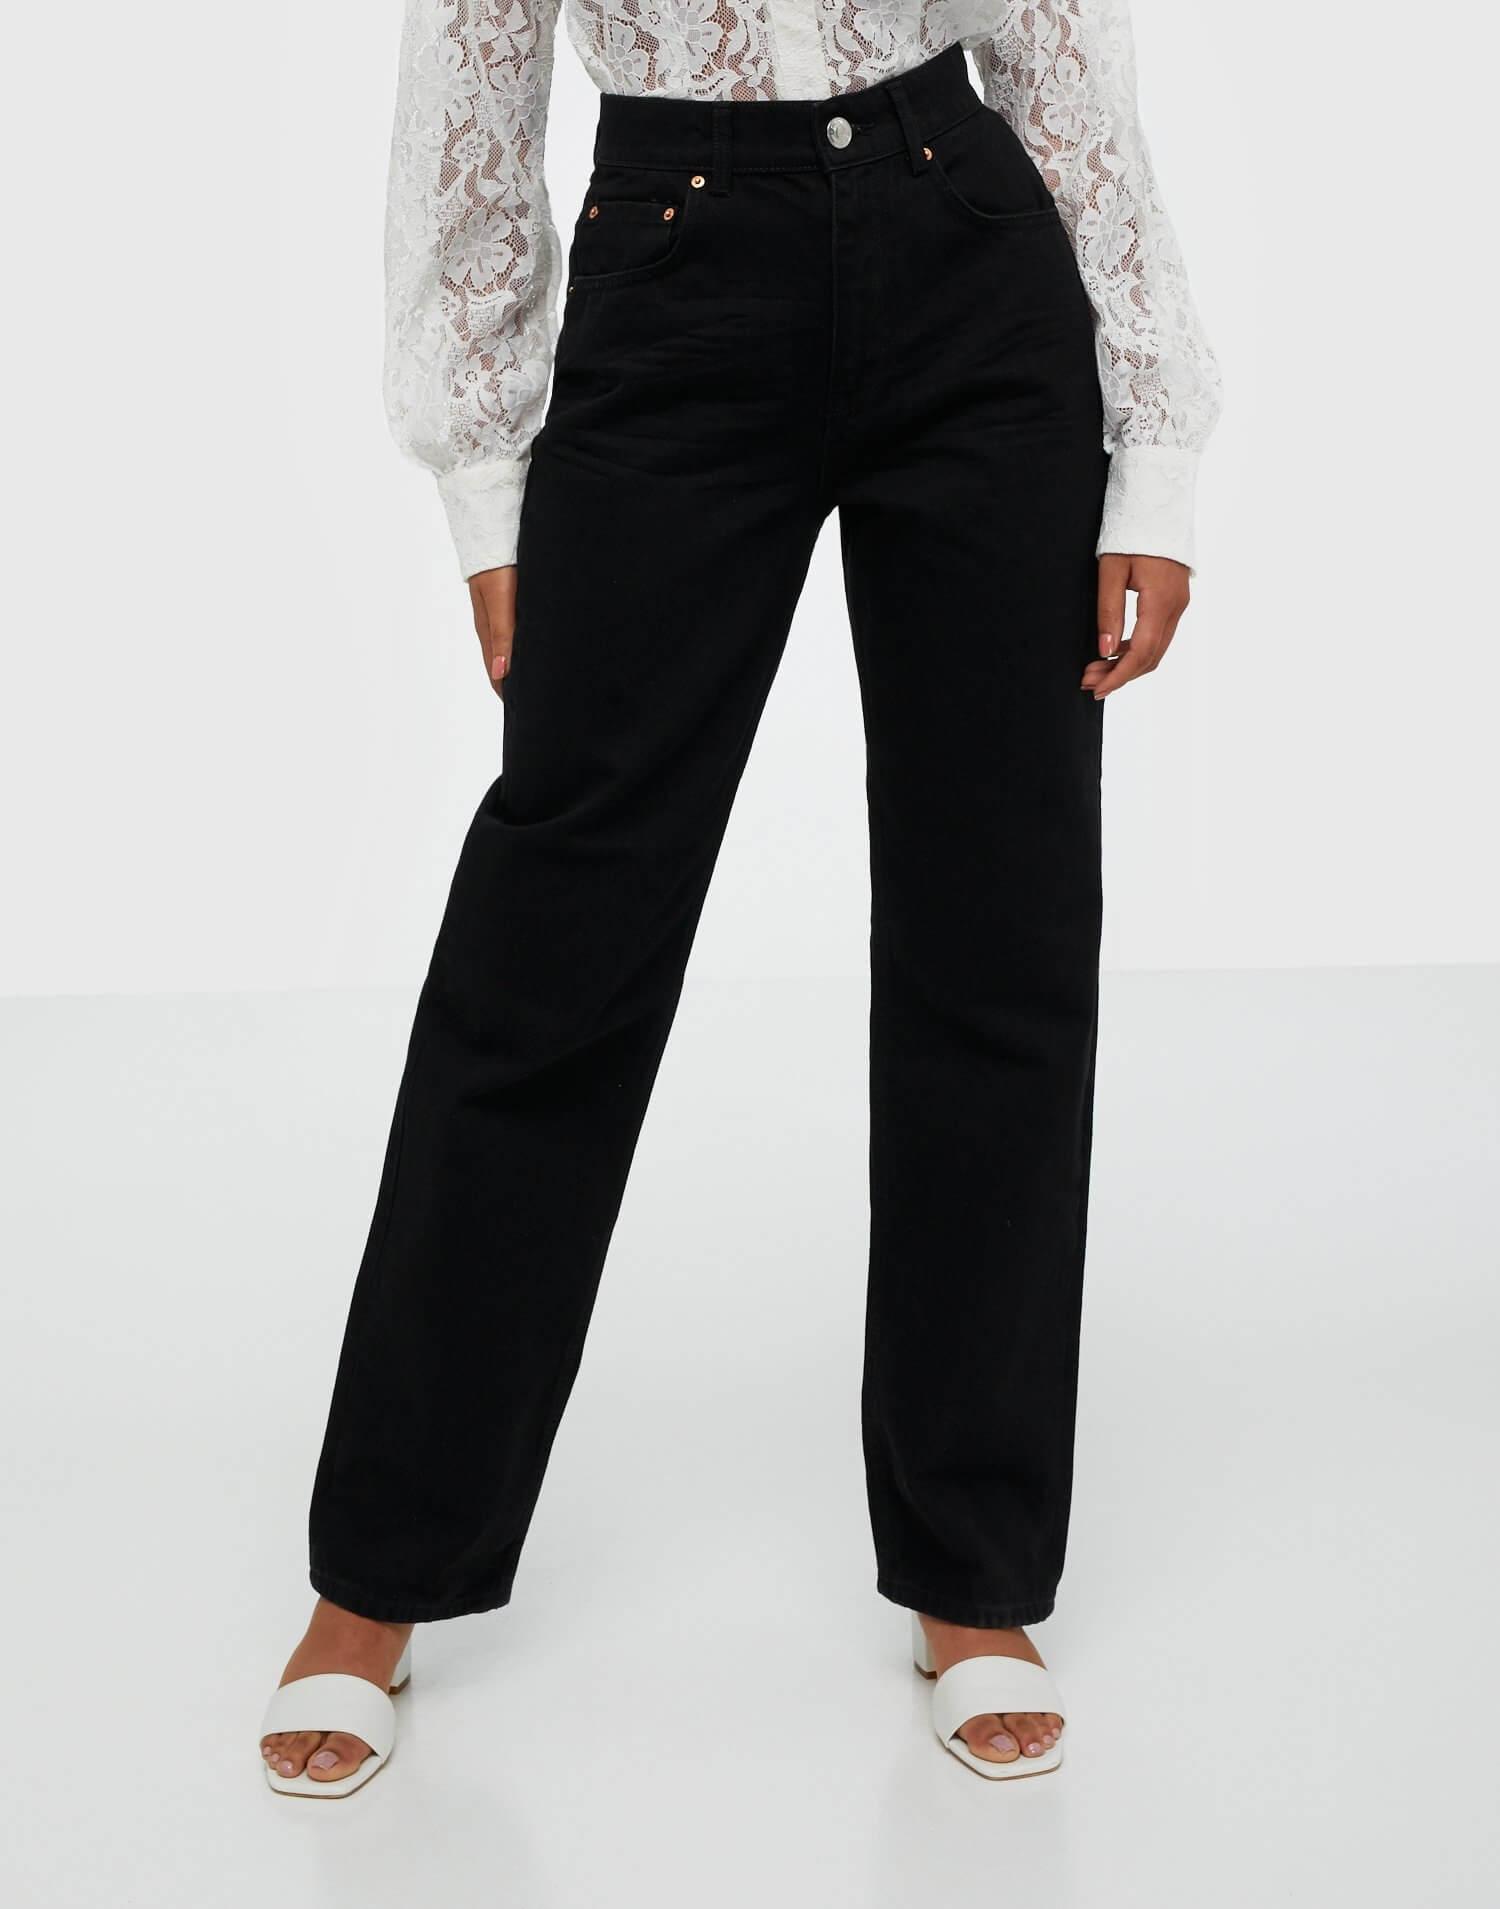 Svarta byxor i loose fit från Gina Tricot.